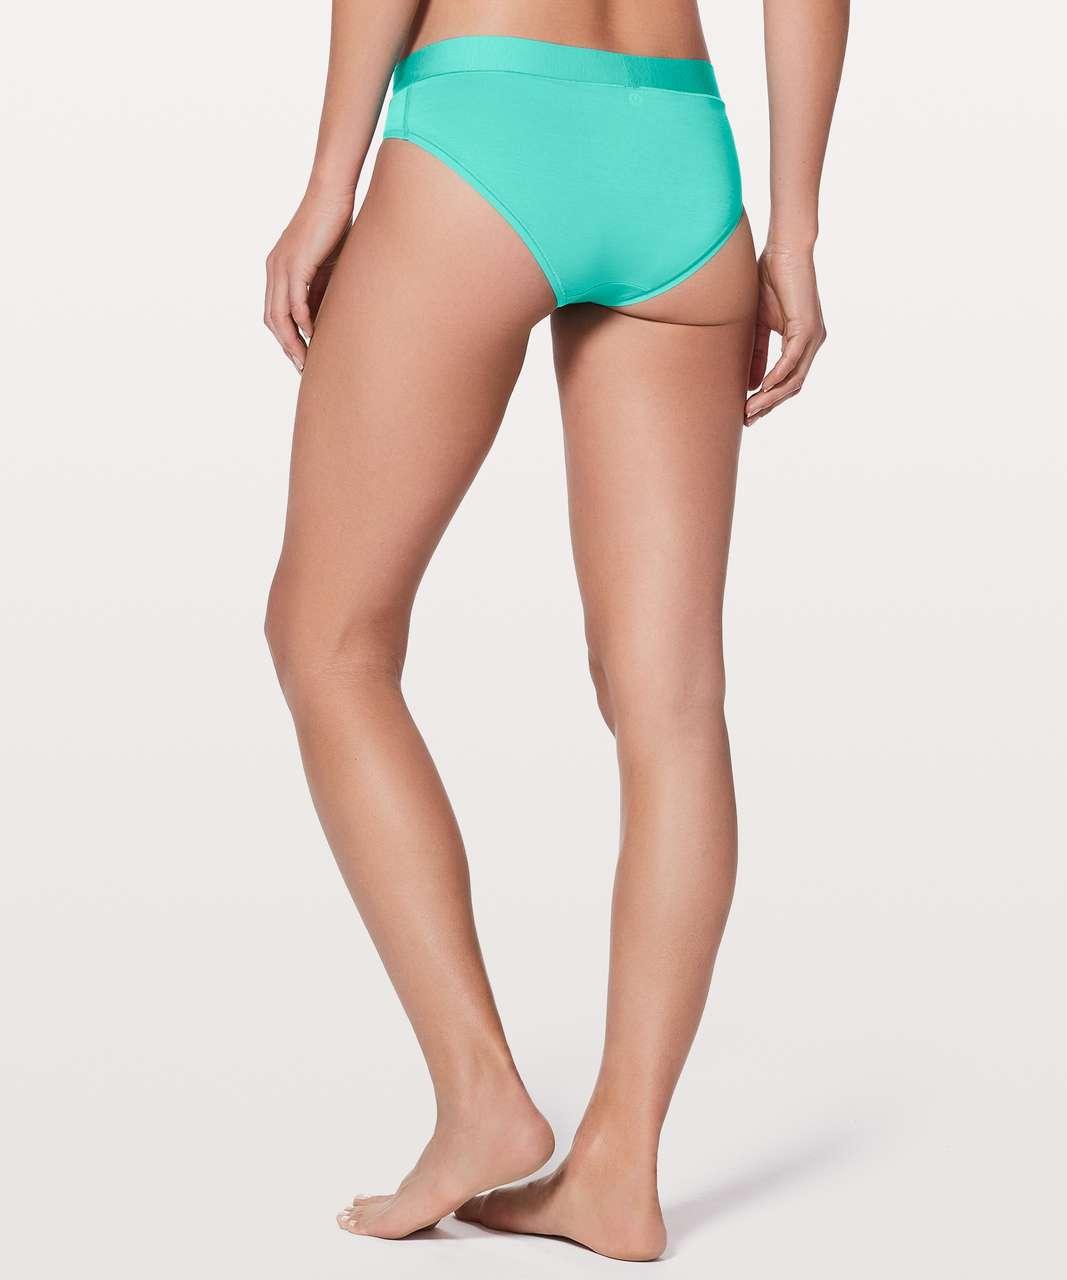 Lululemon Mula Bandhawear Bikini - Eucalyptus